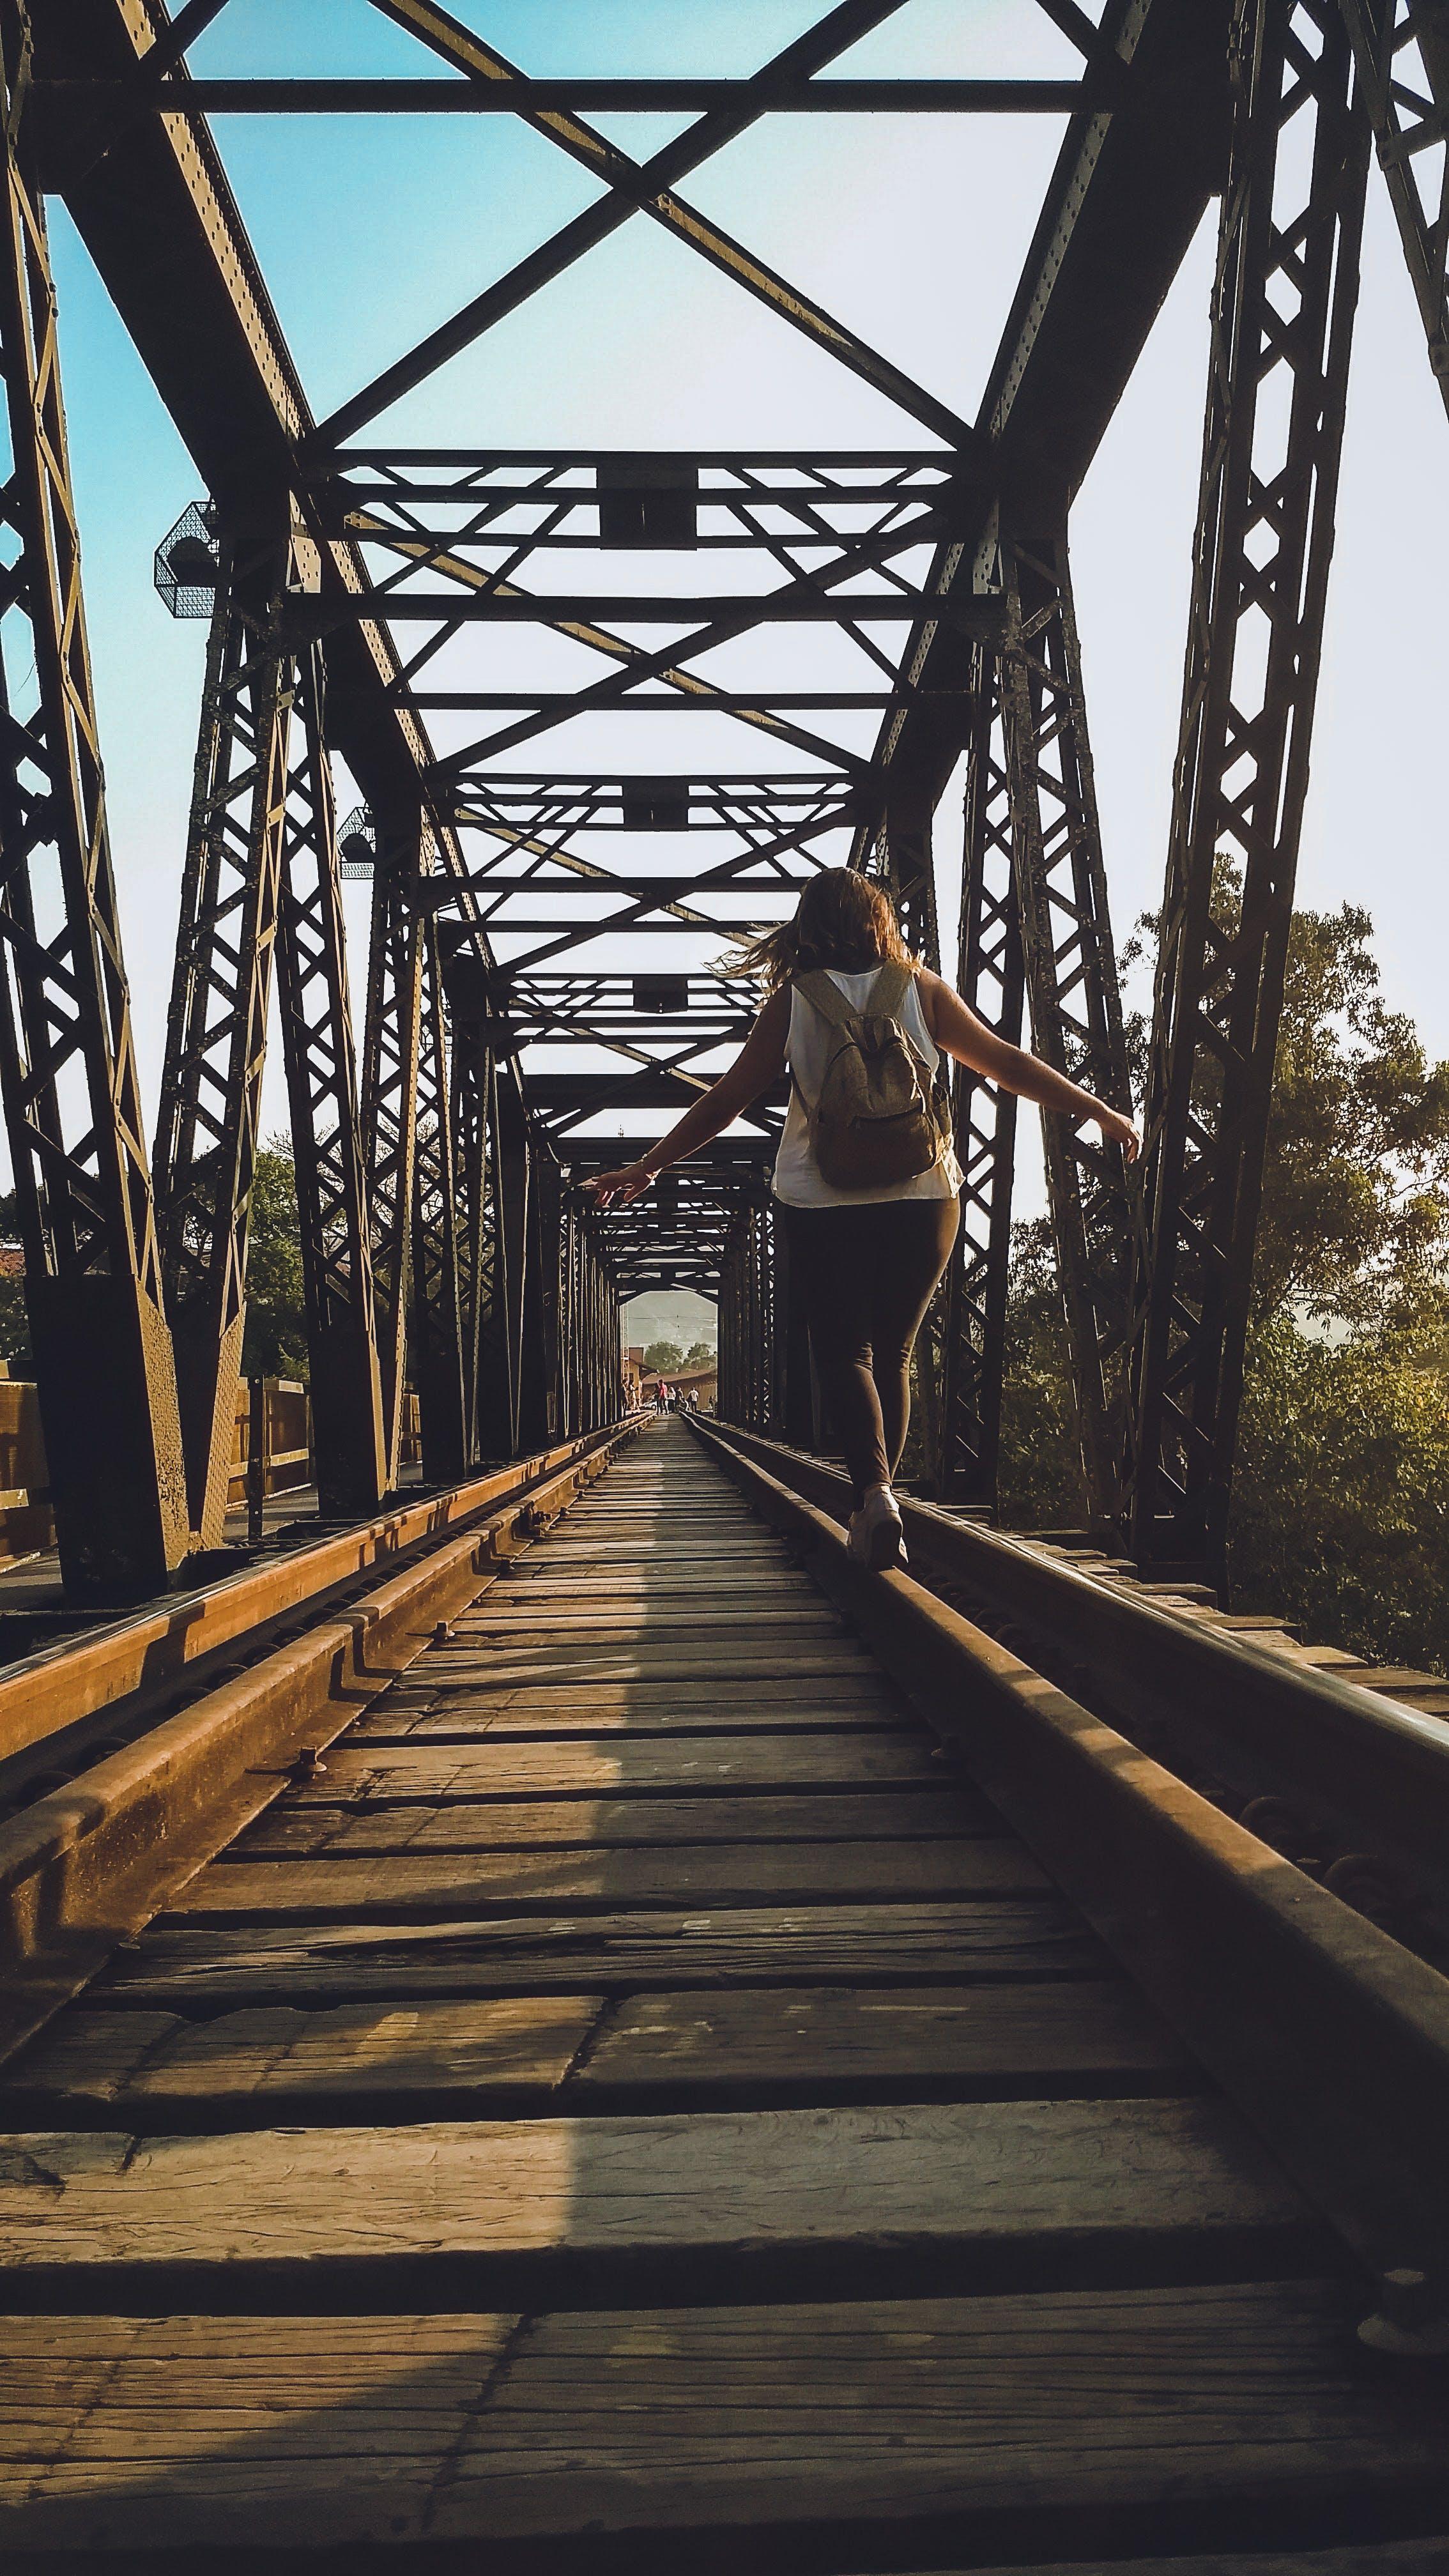 Woman Walking on a Train Rail